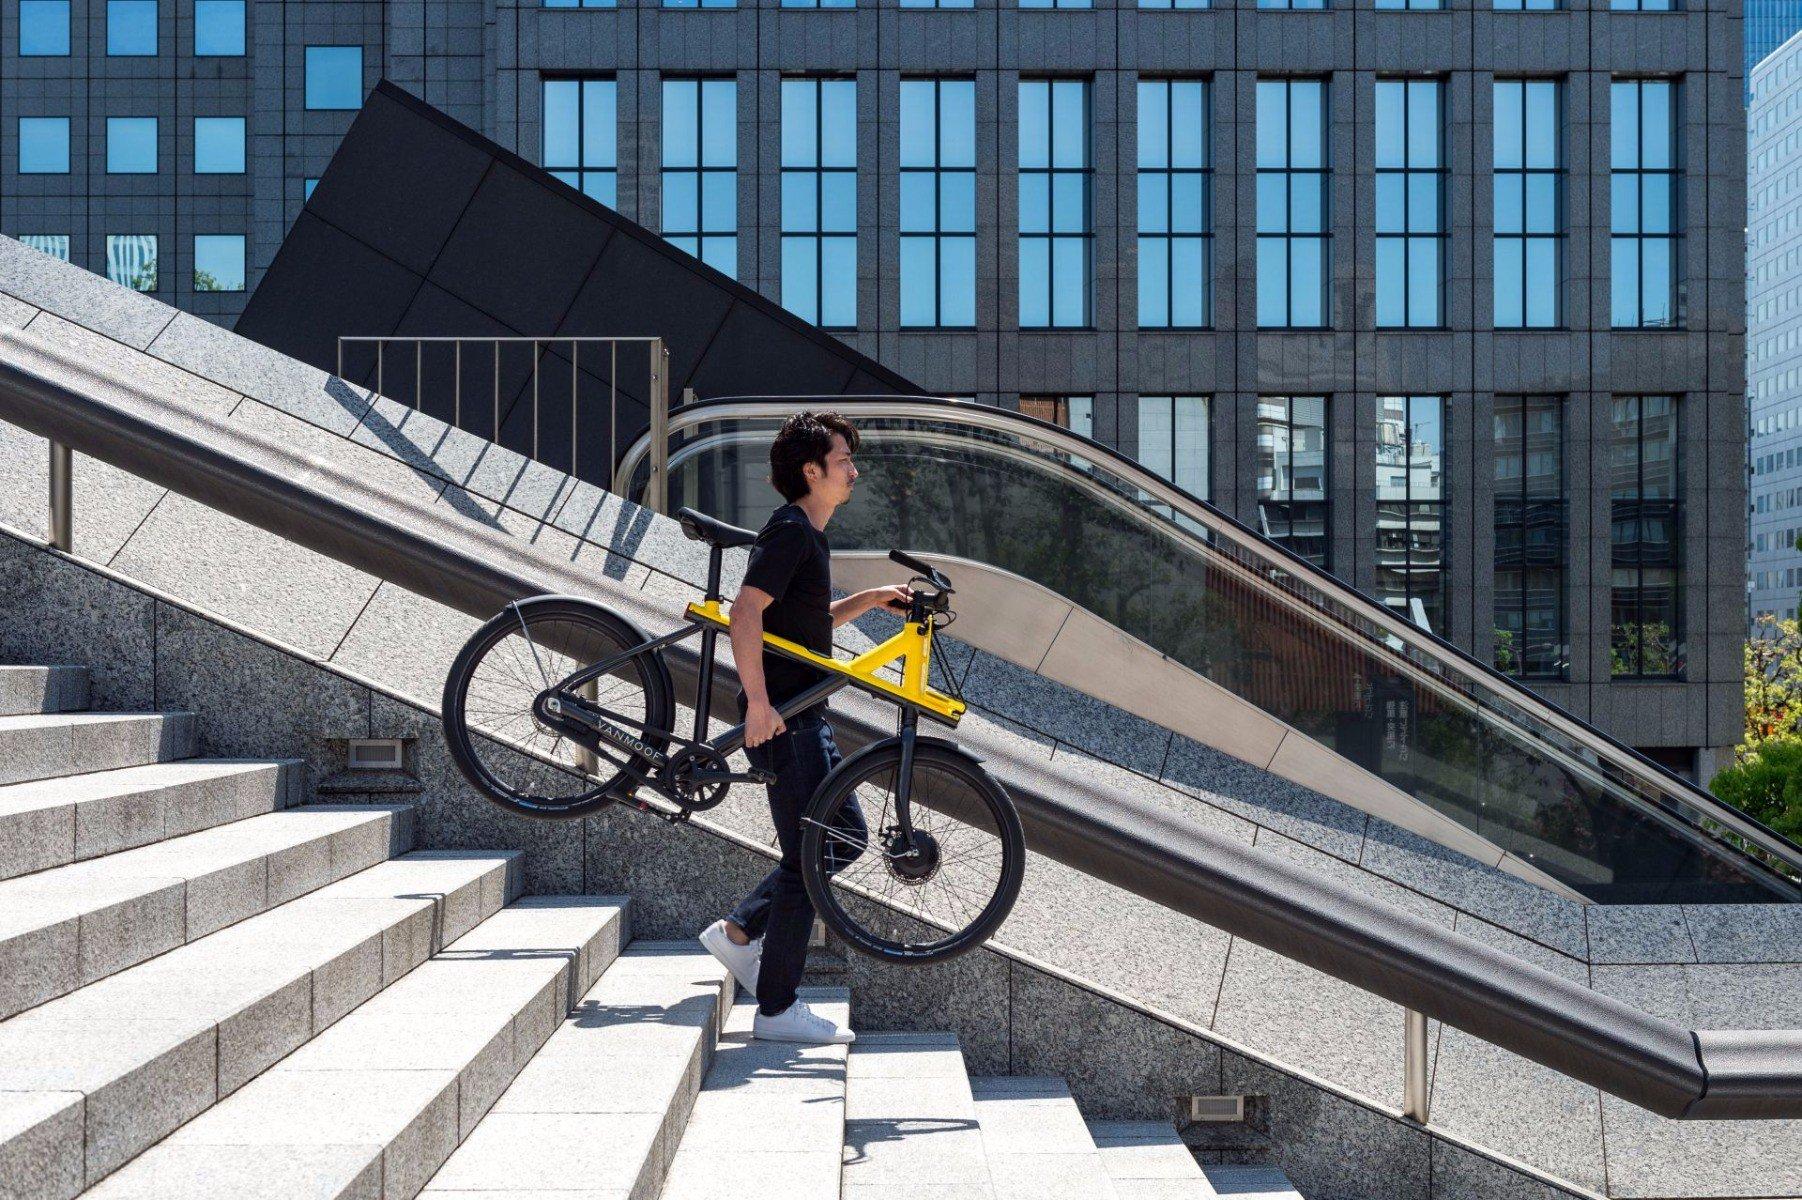 Vanmoof S Latest Electric Bike Takes On Hellish Tokyo